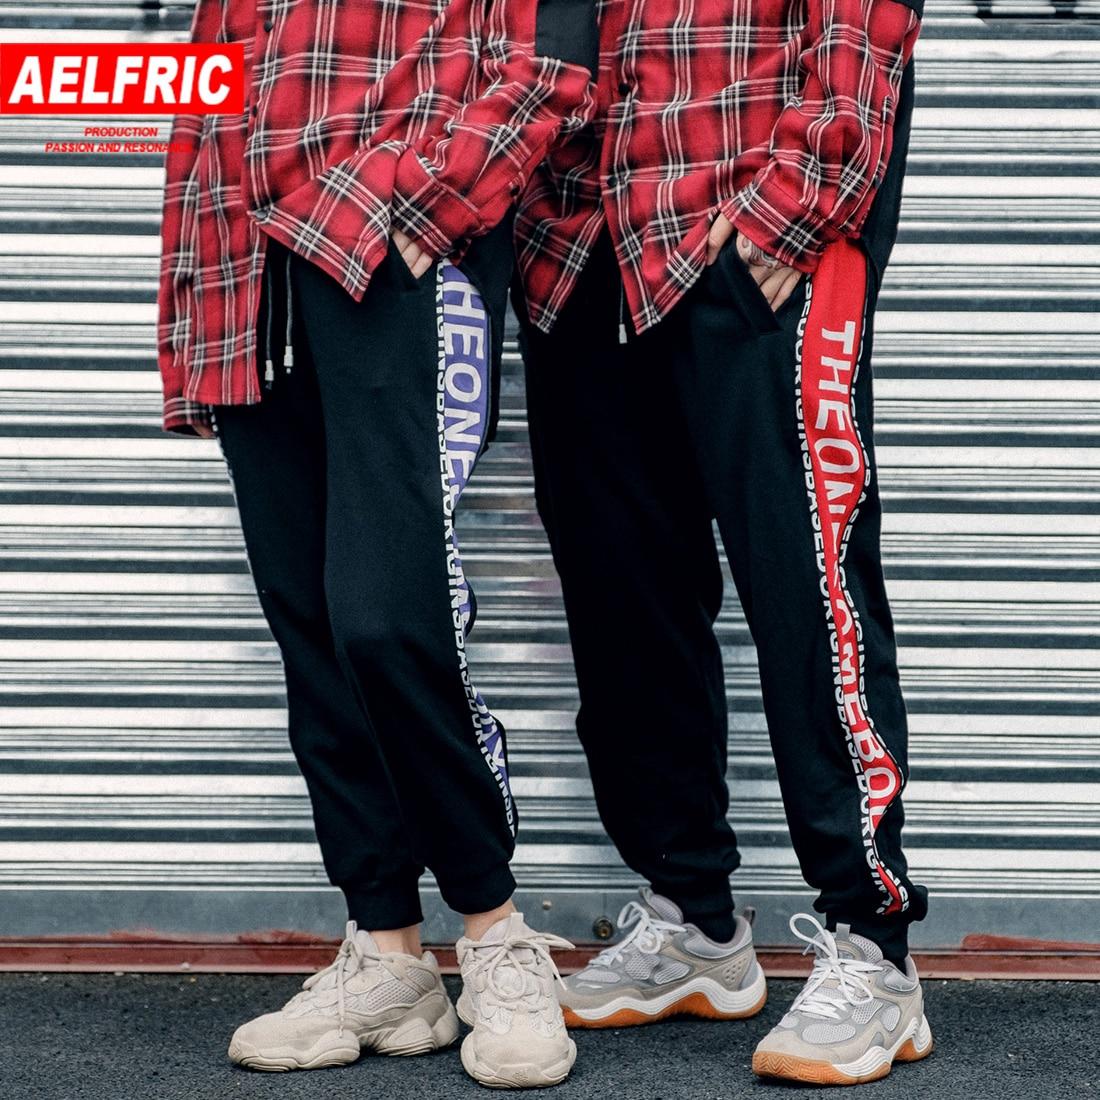 Aelfric Hip Hop Pants Side Track Zipper Design Streetwear Women Fashion Trousers Printed Haren Pants Unisex Swearpants KJ348 thumbnail